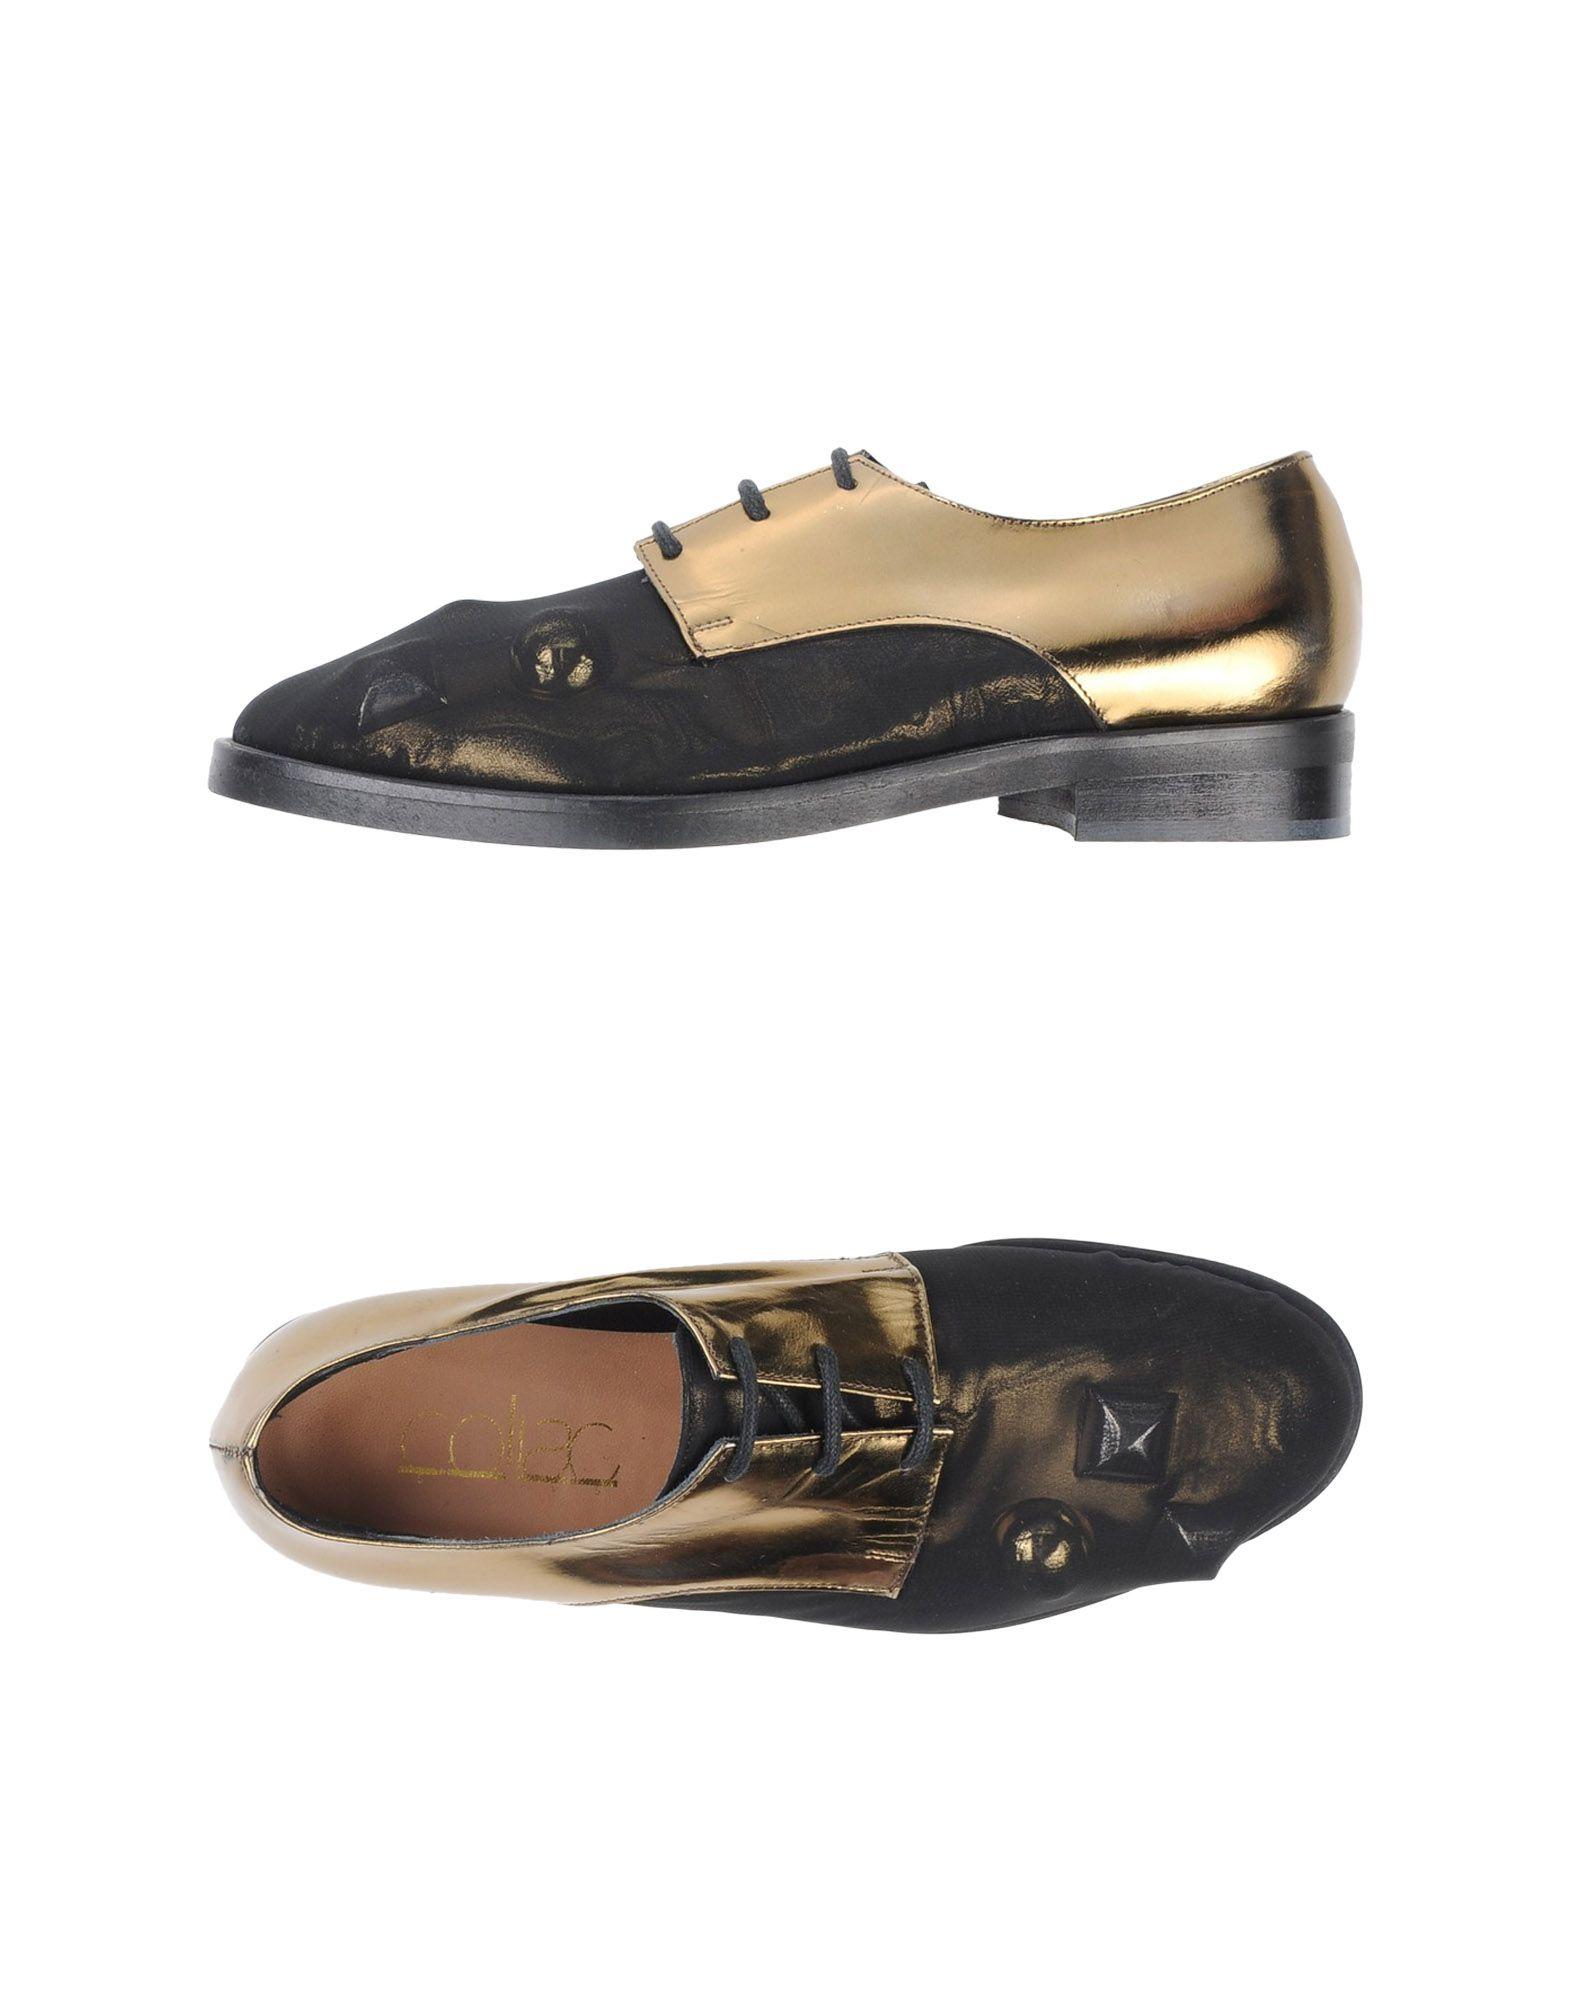 COLIAC MARTINA GRASSELLI Обувь на шнурках coliàc martina grasselli сандалии